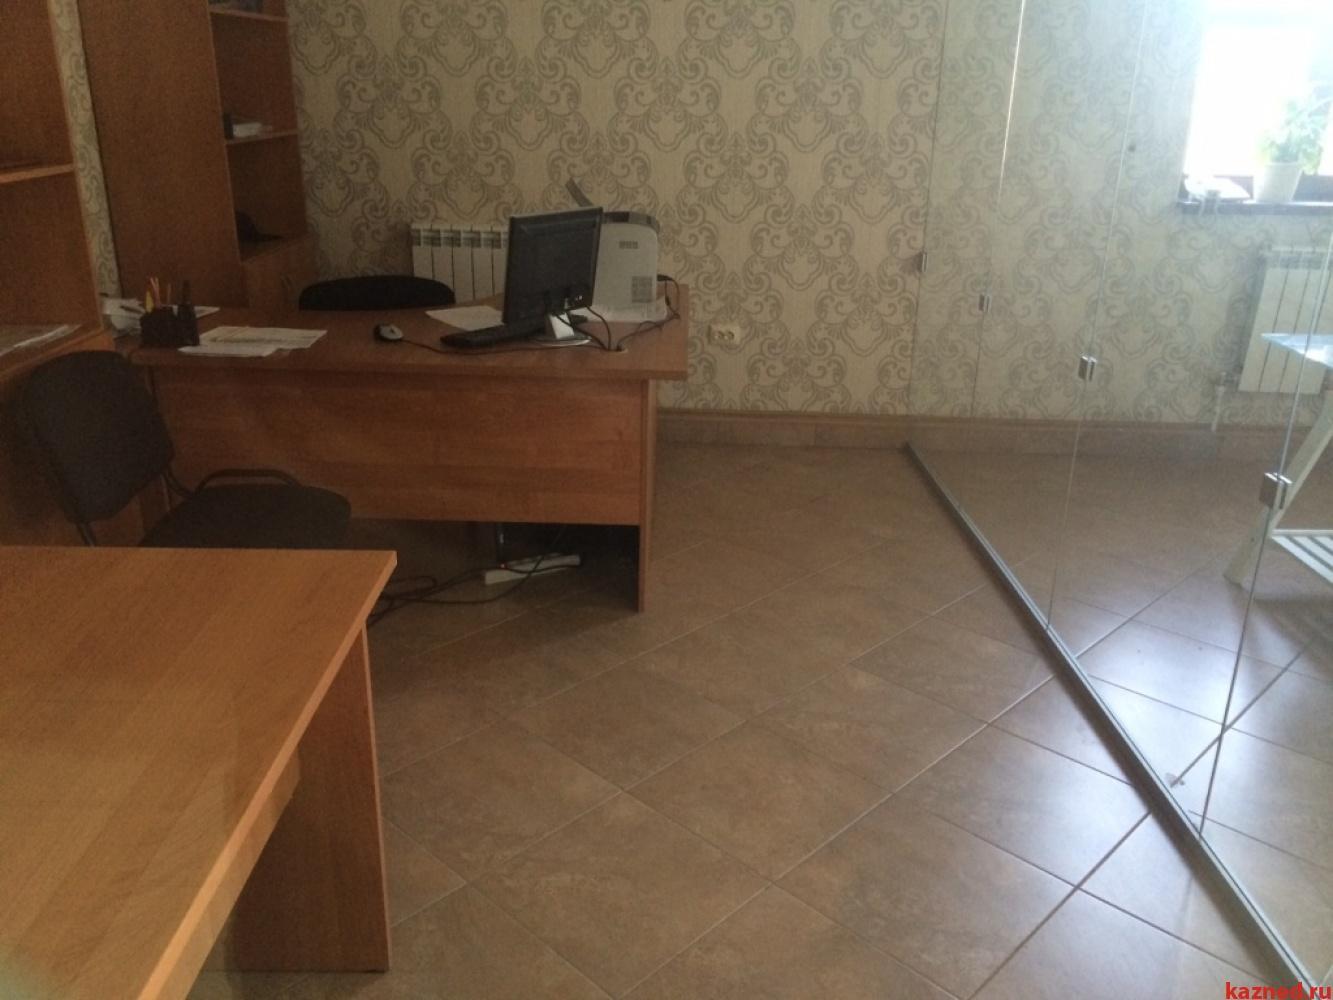 Аренда  офисно-торговые Пушкина д. 52, 14 м²  (миниатюра №2)